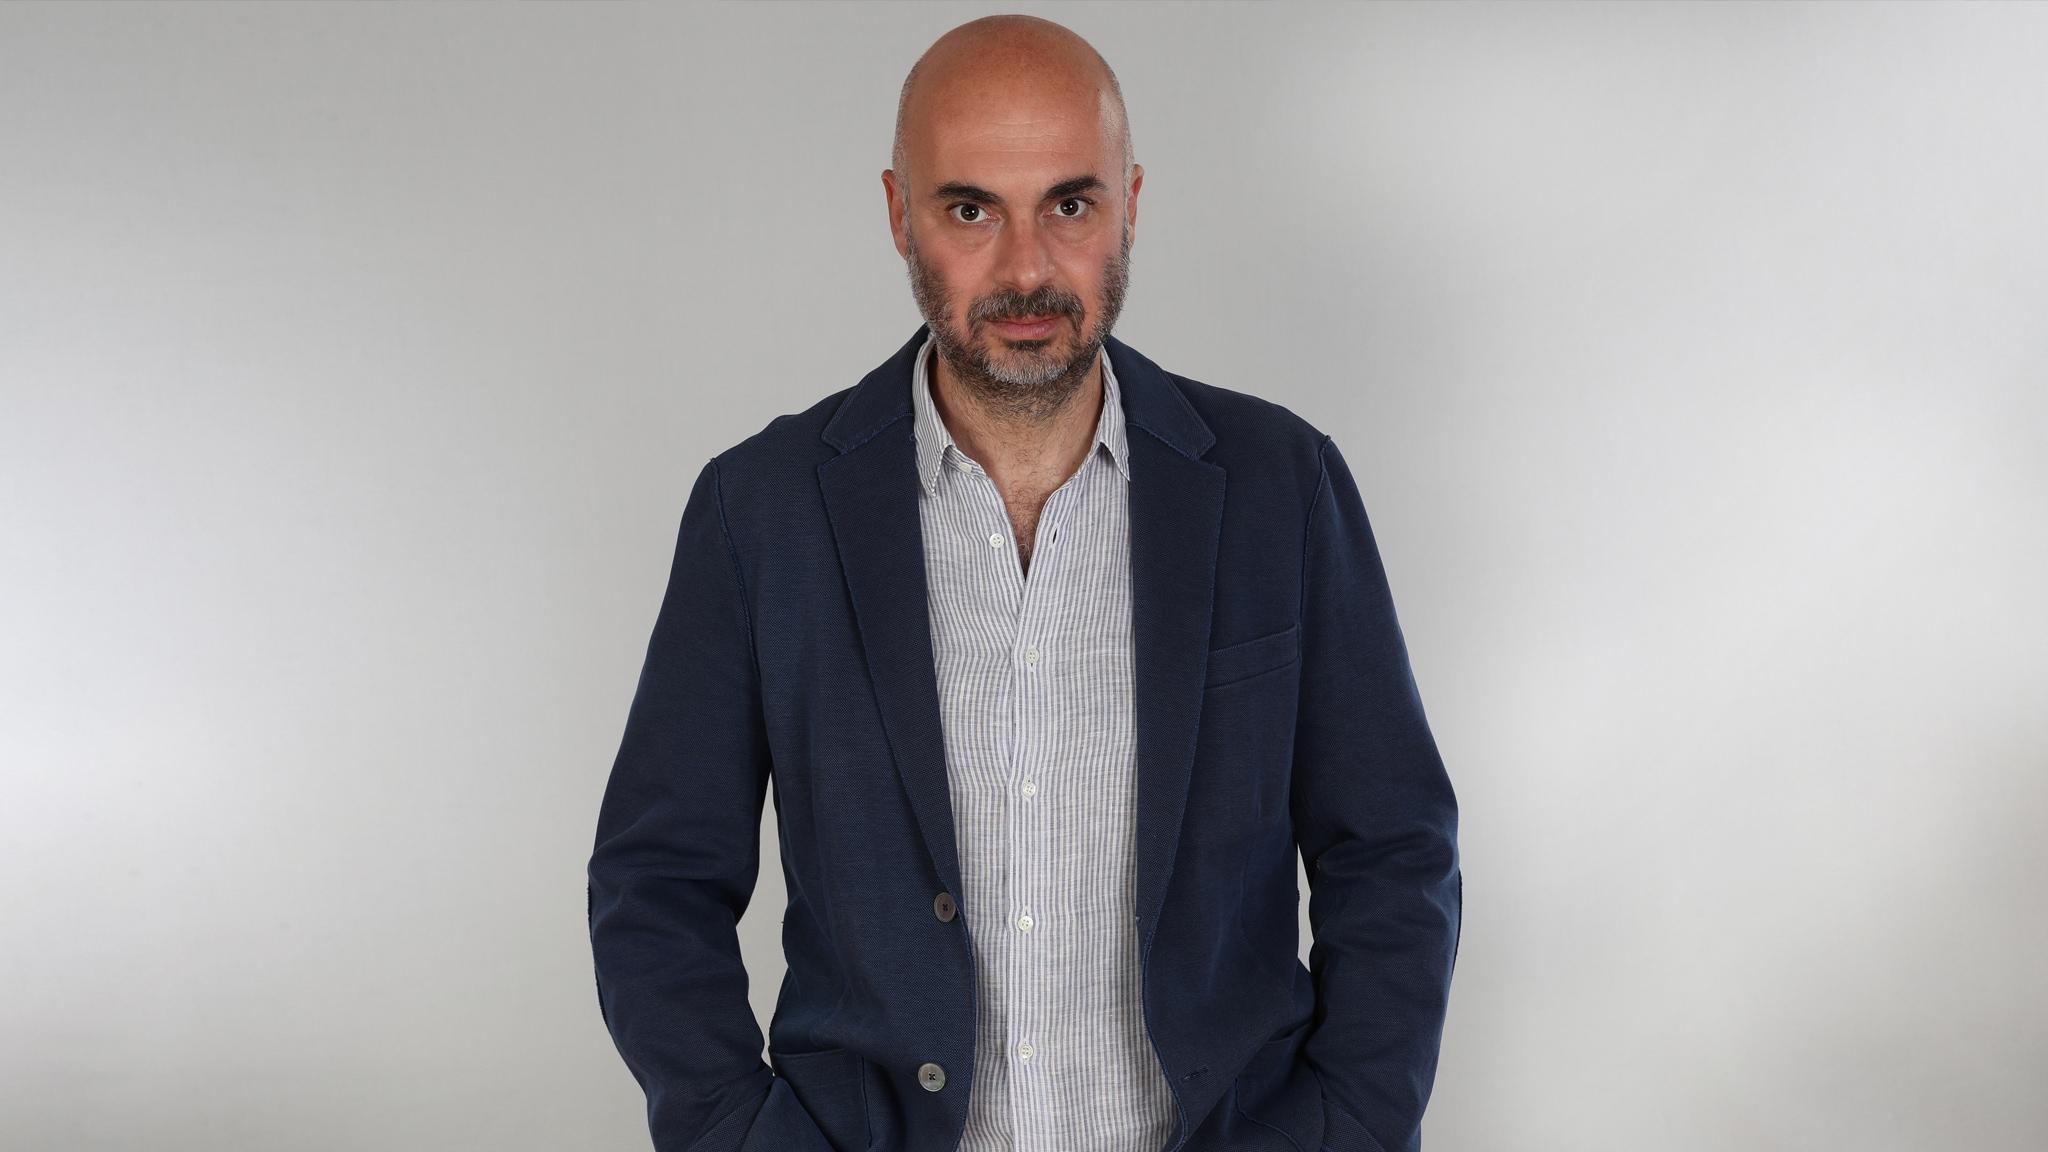 Rai Storia #Maestri: Mario Tozzi - Elisabetta Moro P13